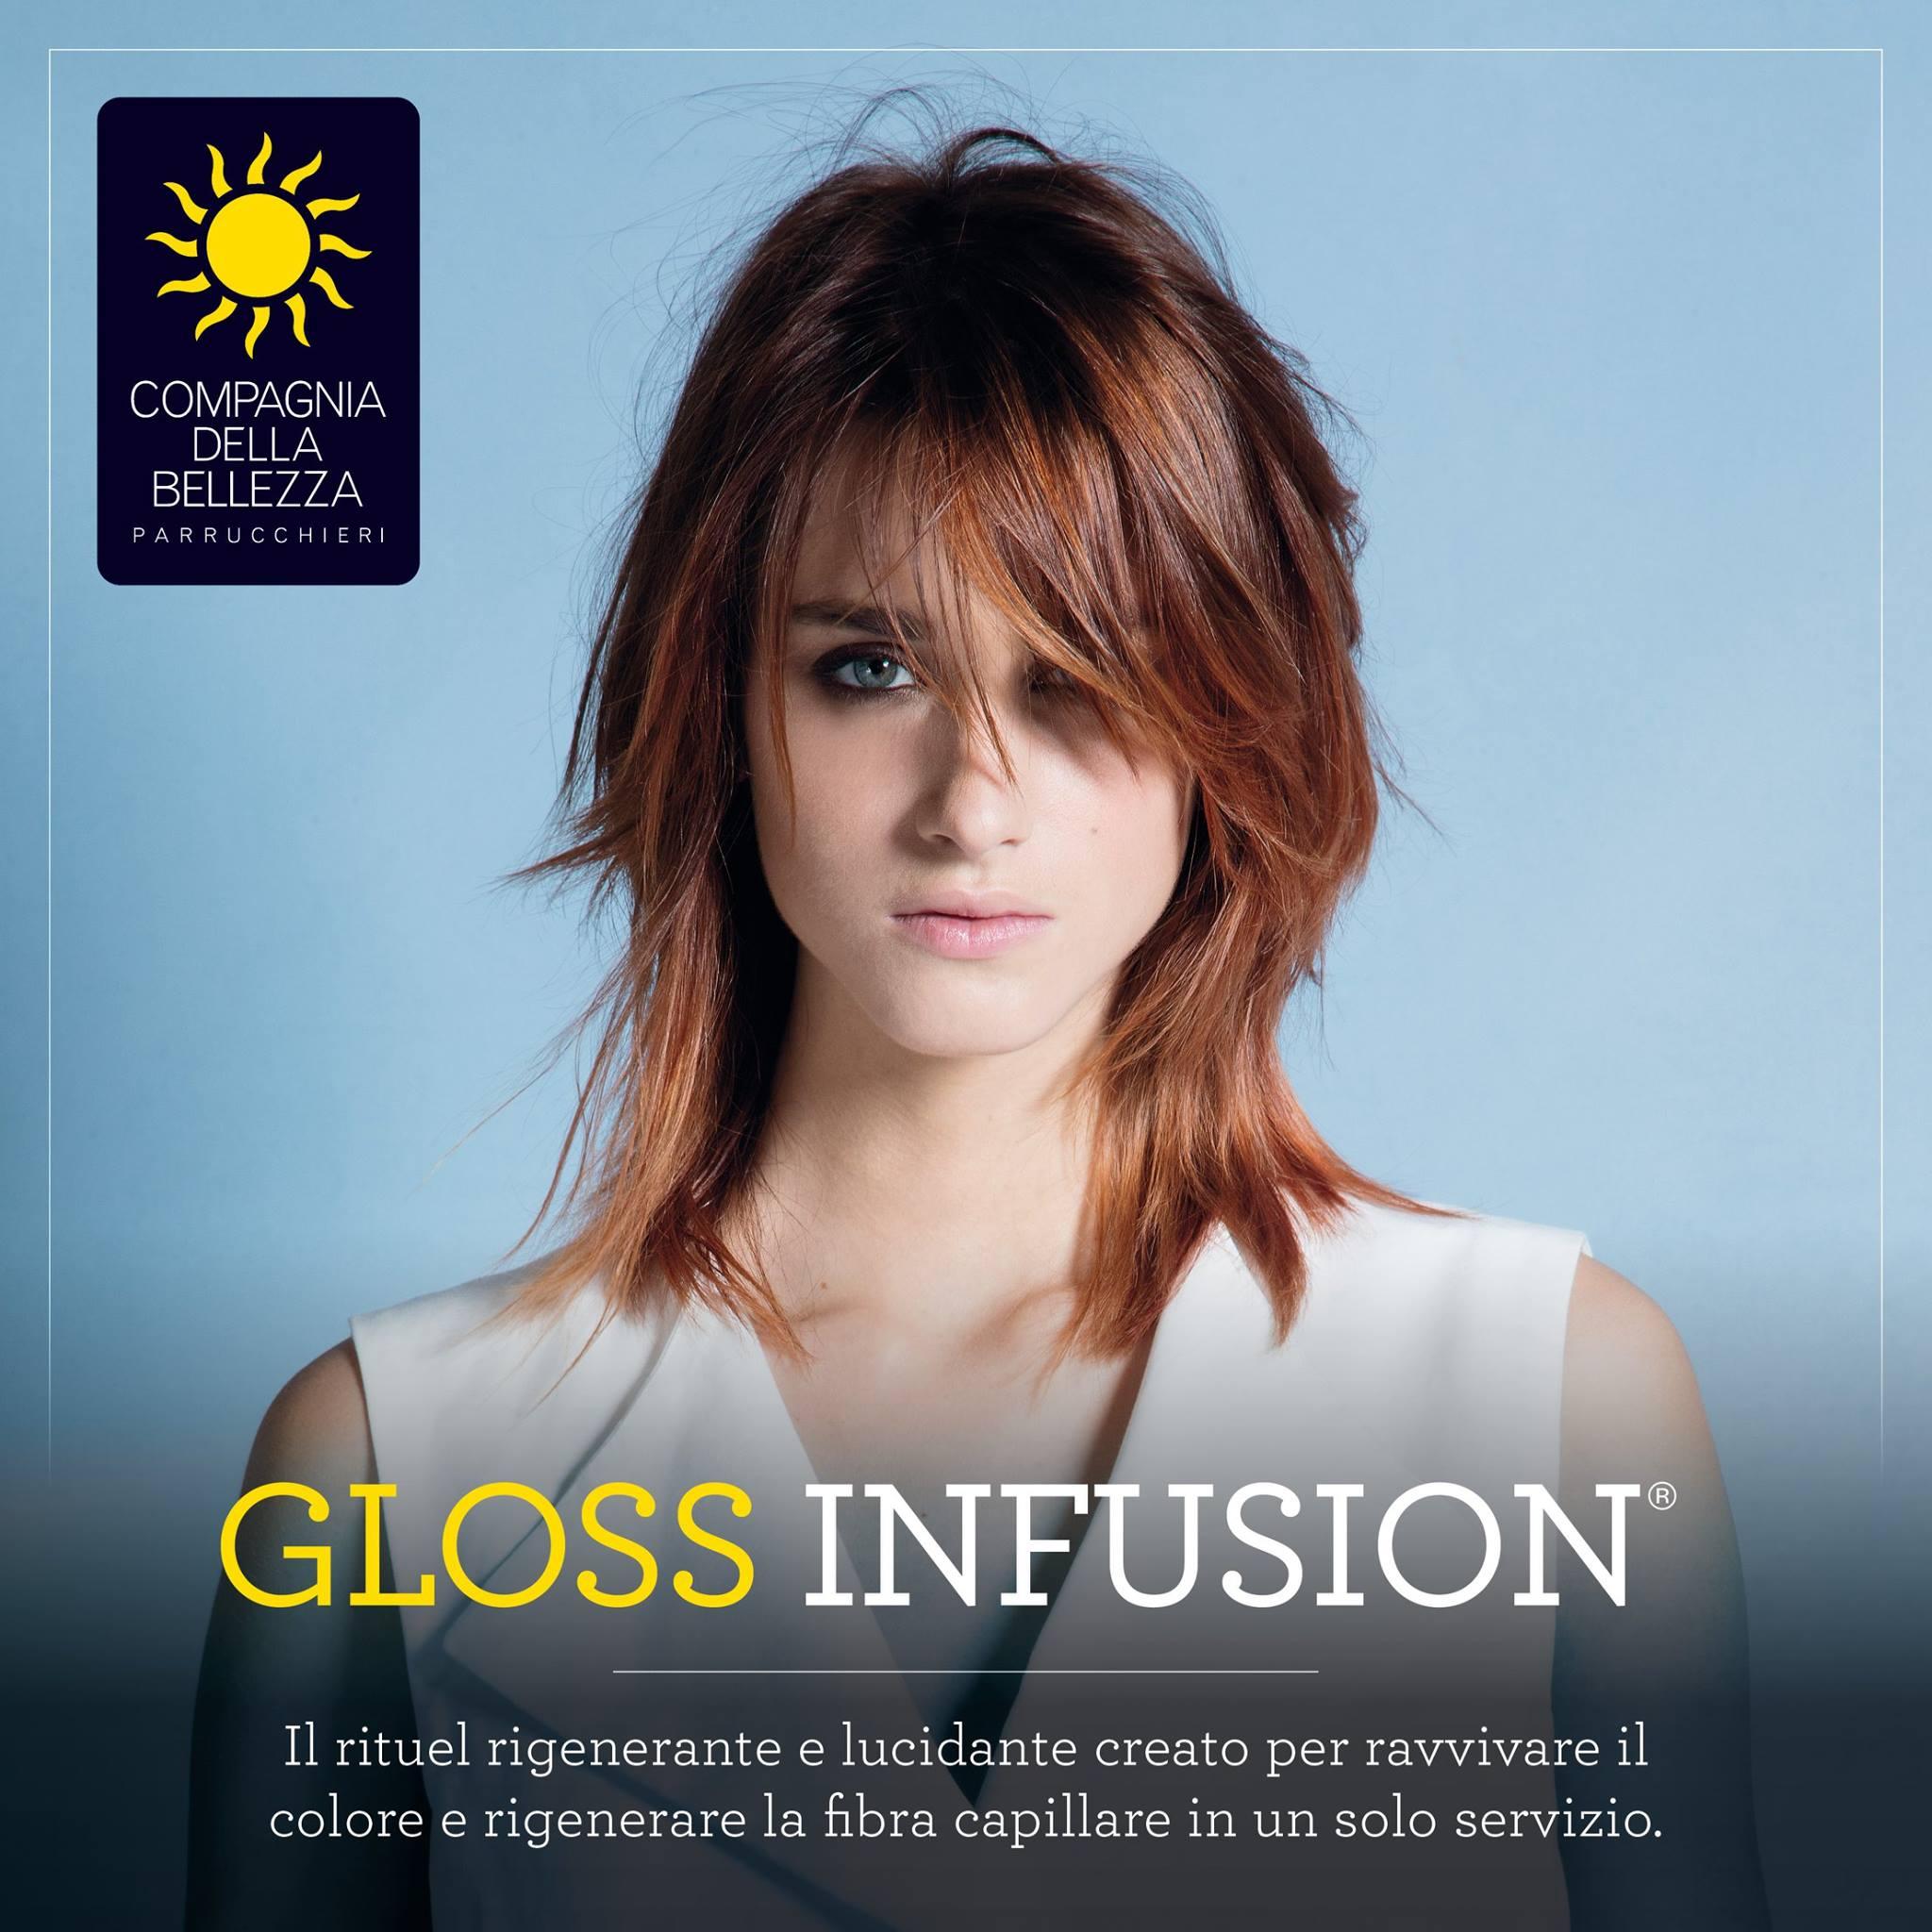 gloss infusion